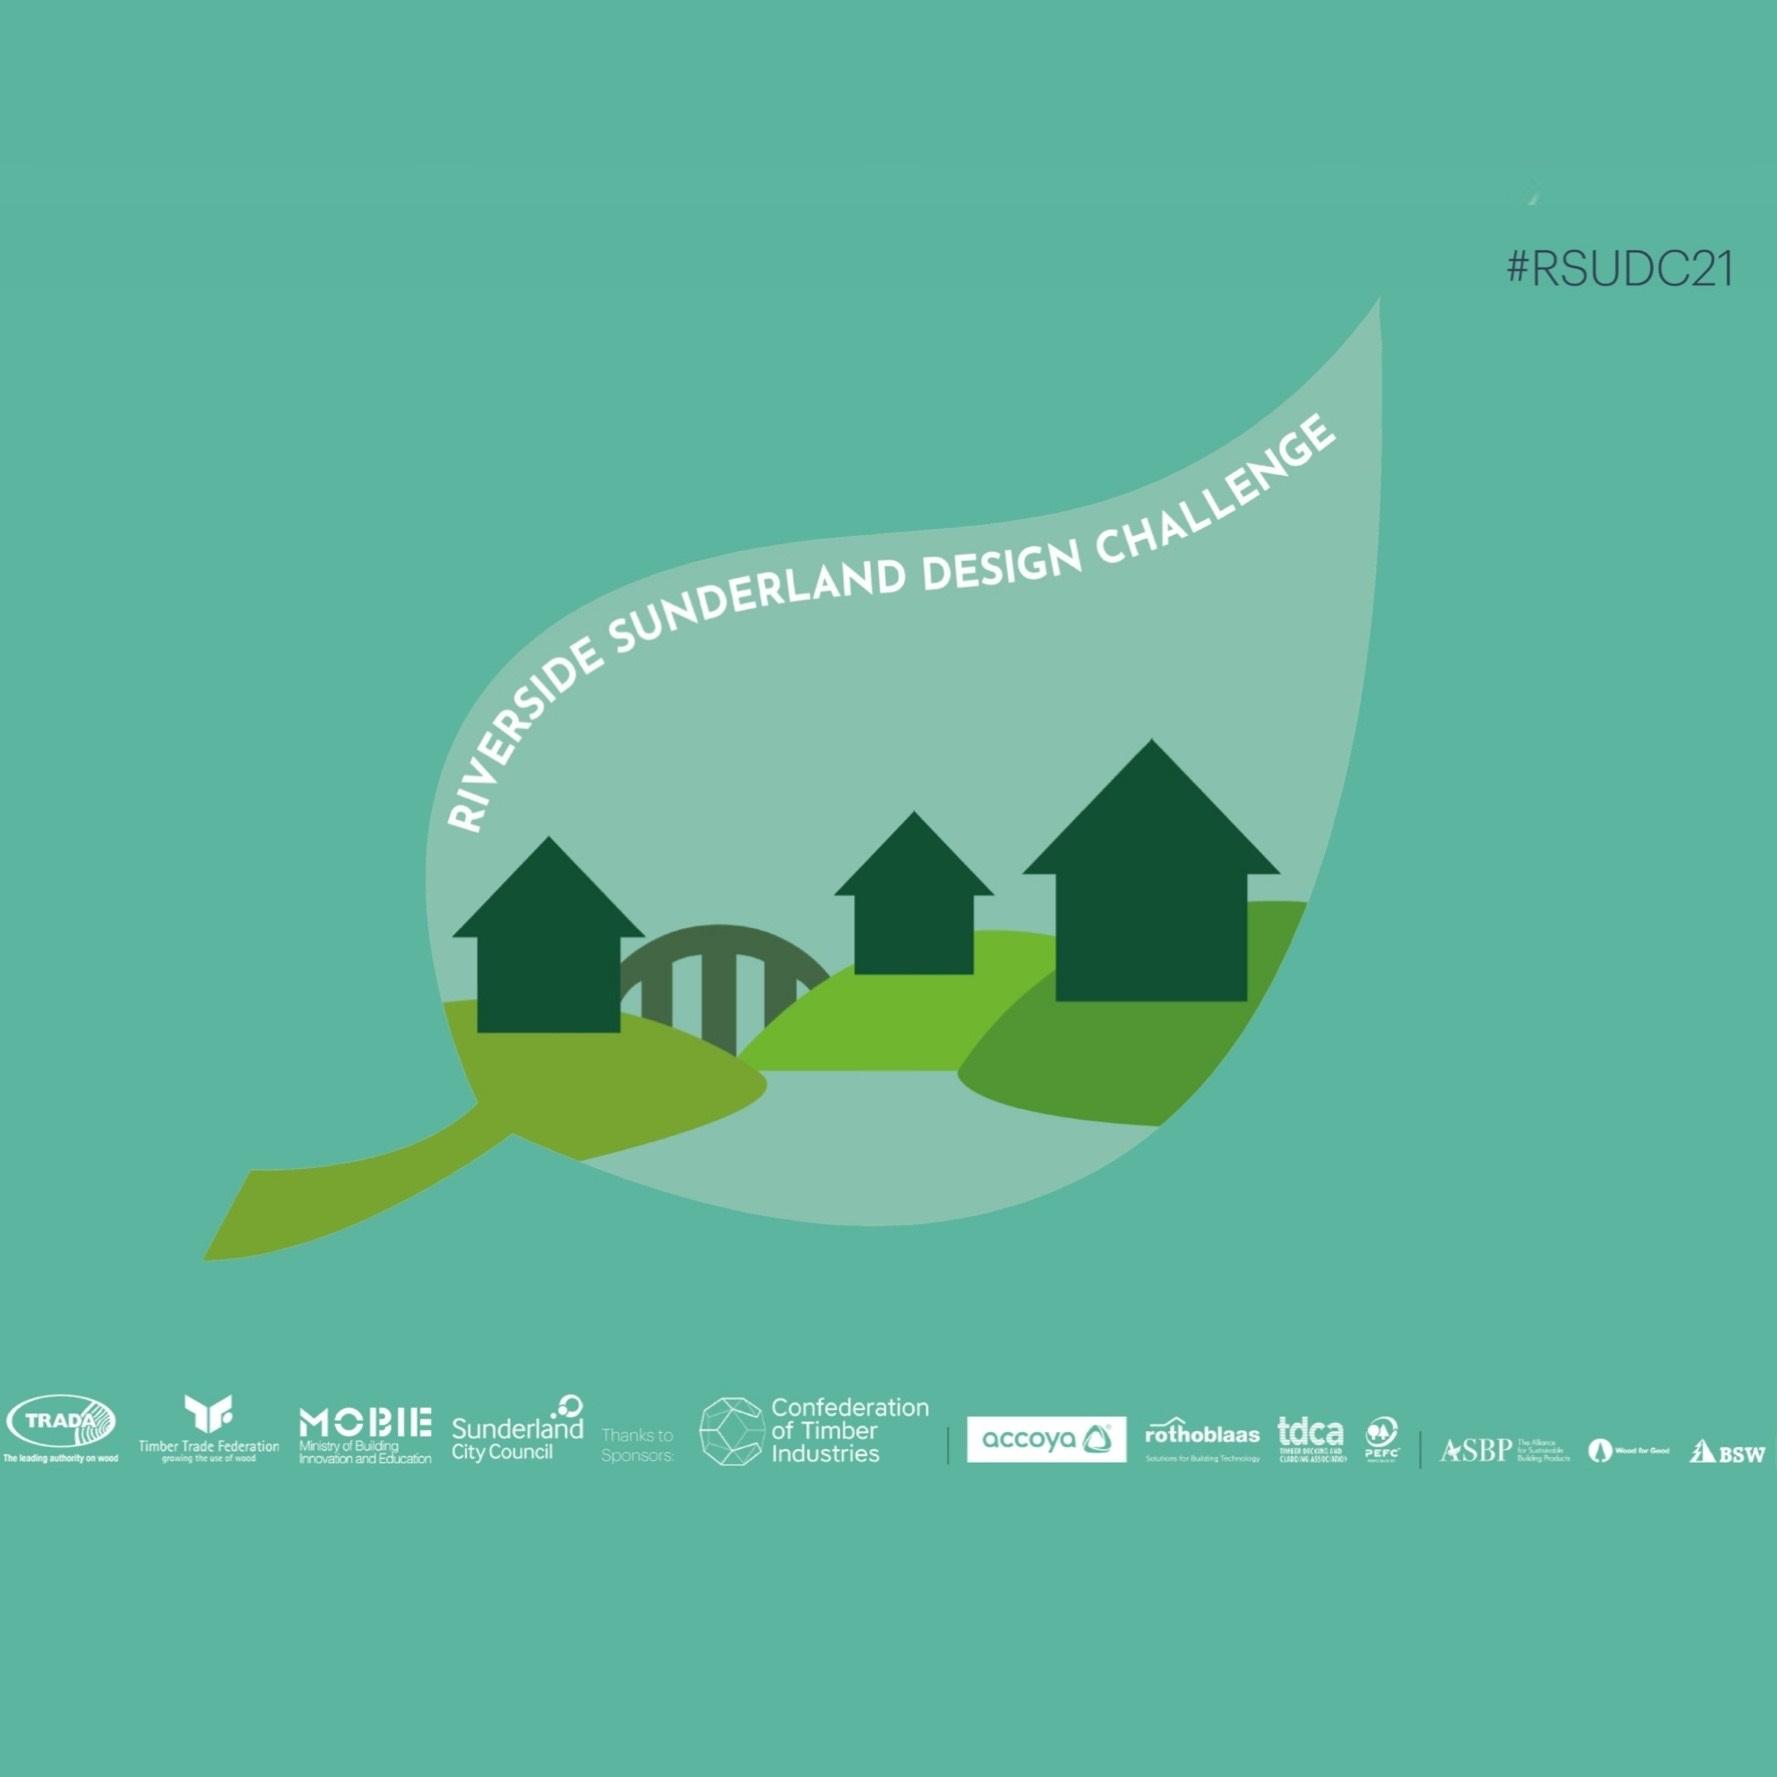 ASBP supports the Riverside Sunderland University Design Competition 2021